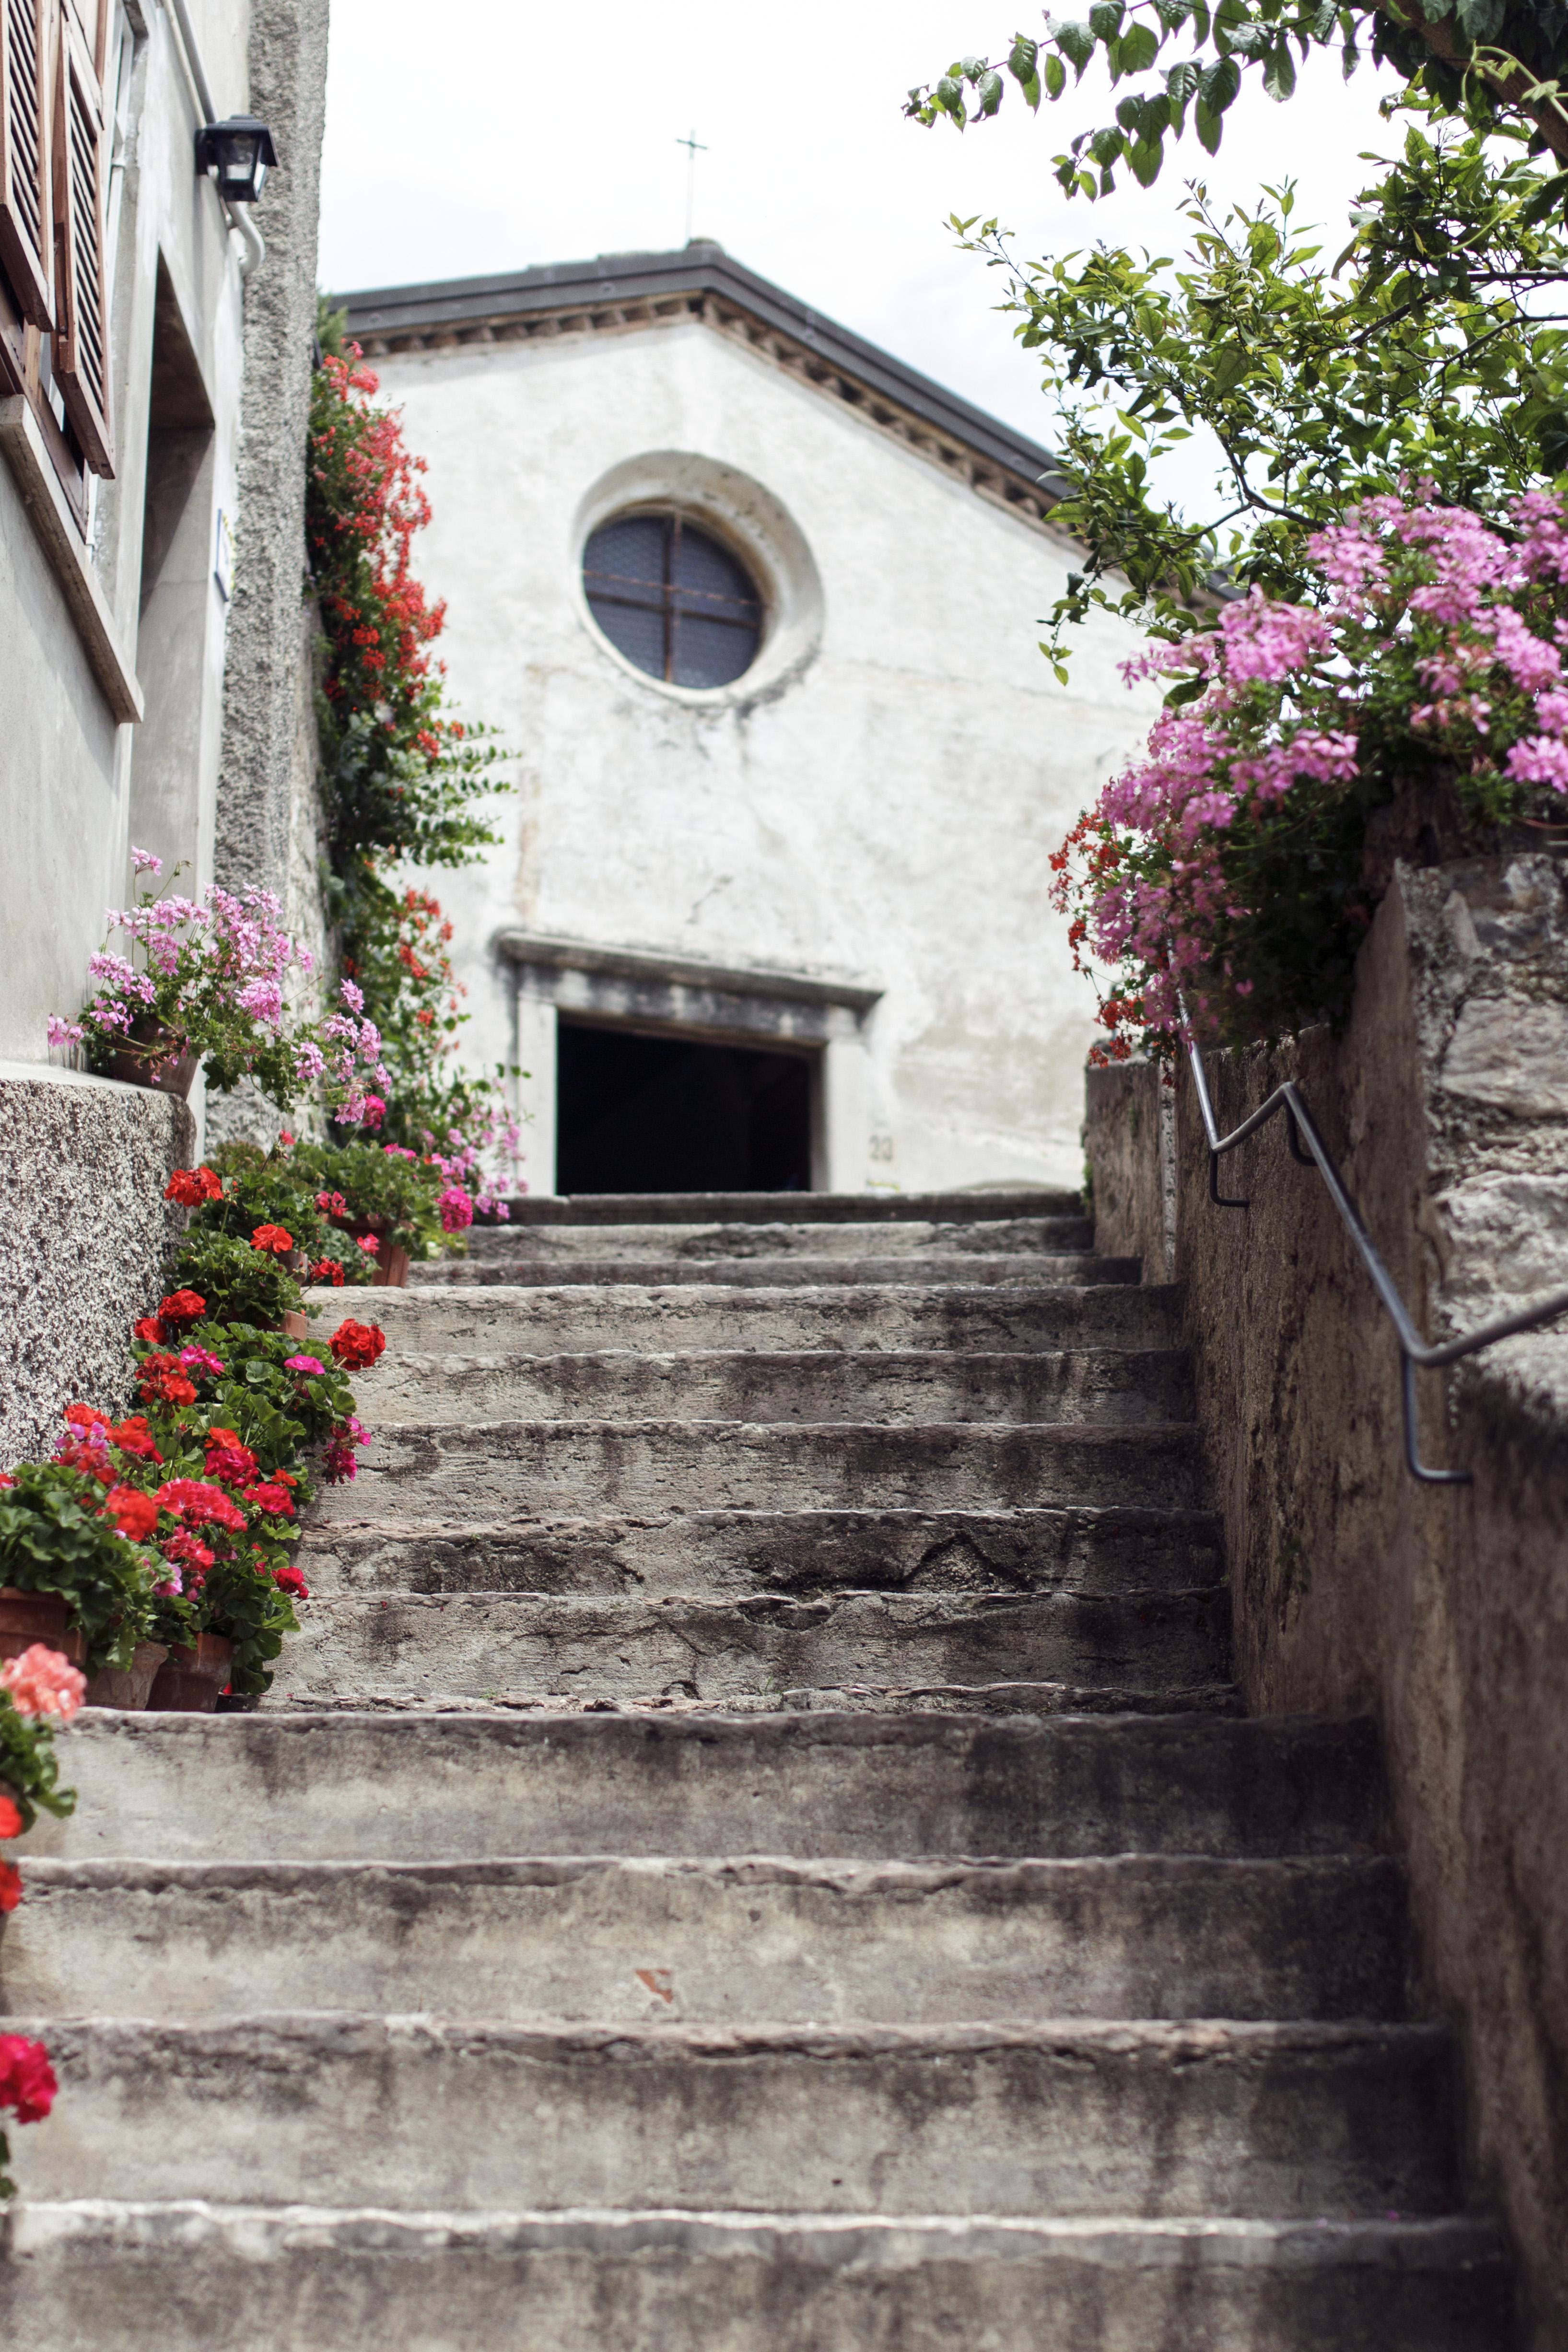 Viajamos al Lago de Garda-16904-cristinablanco